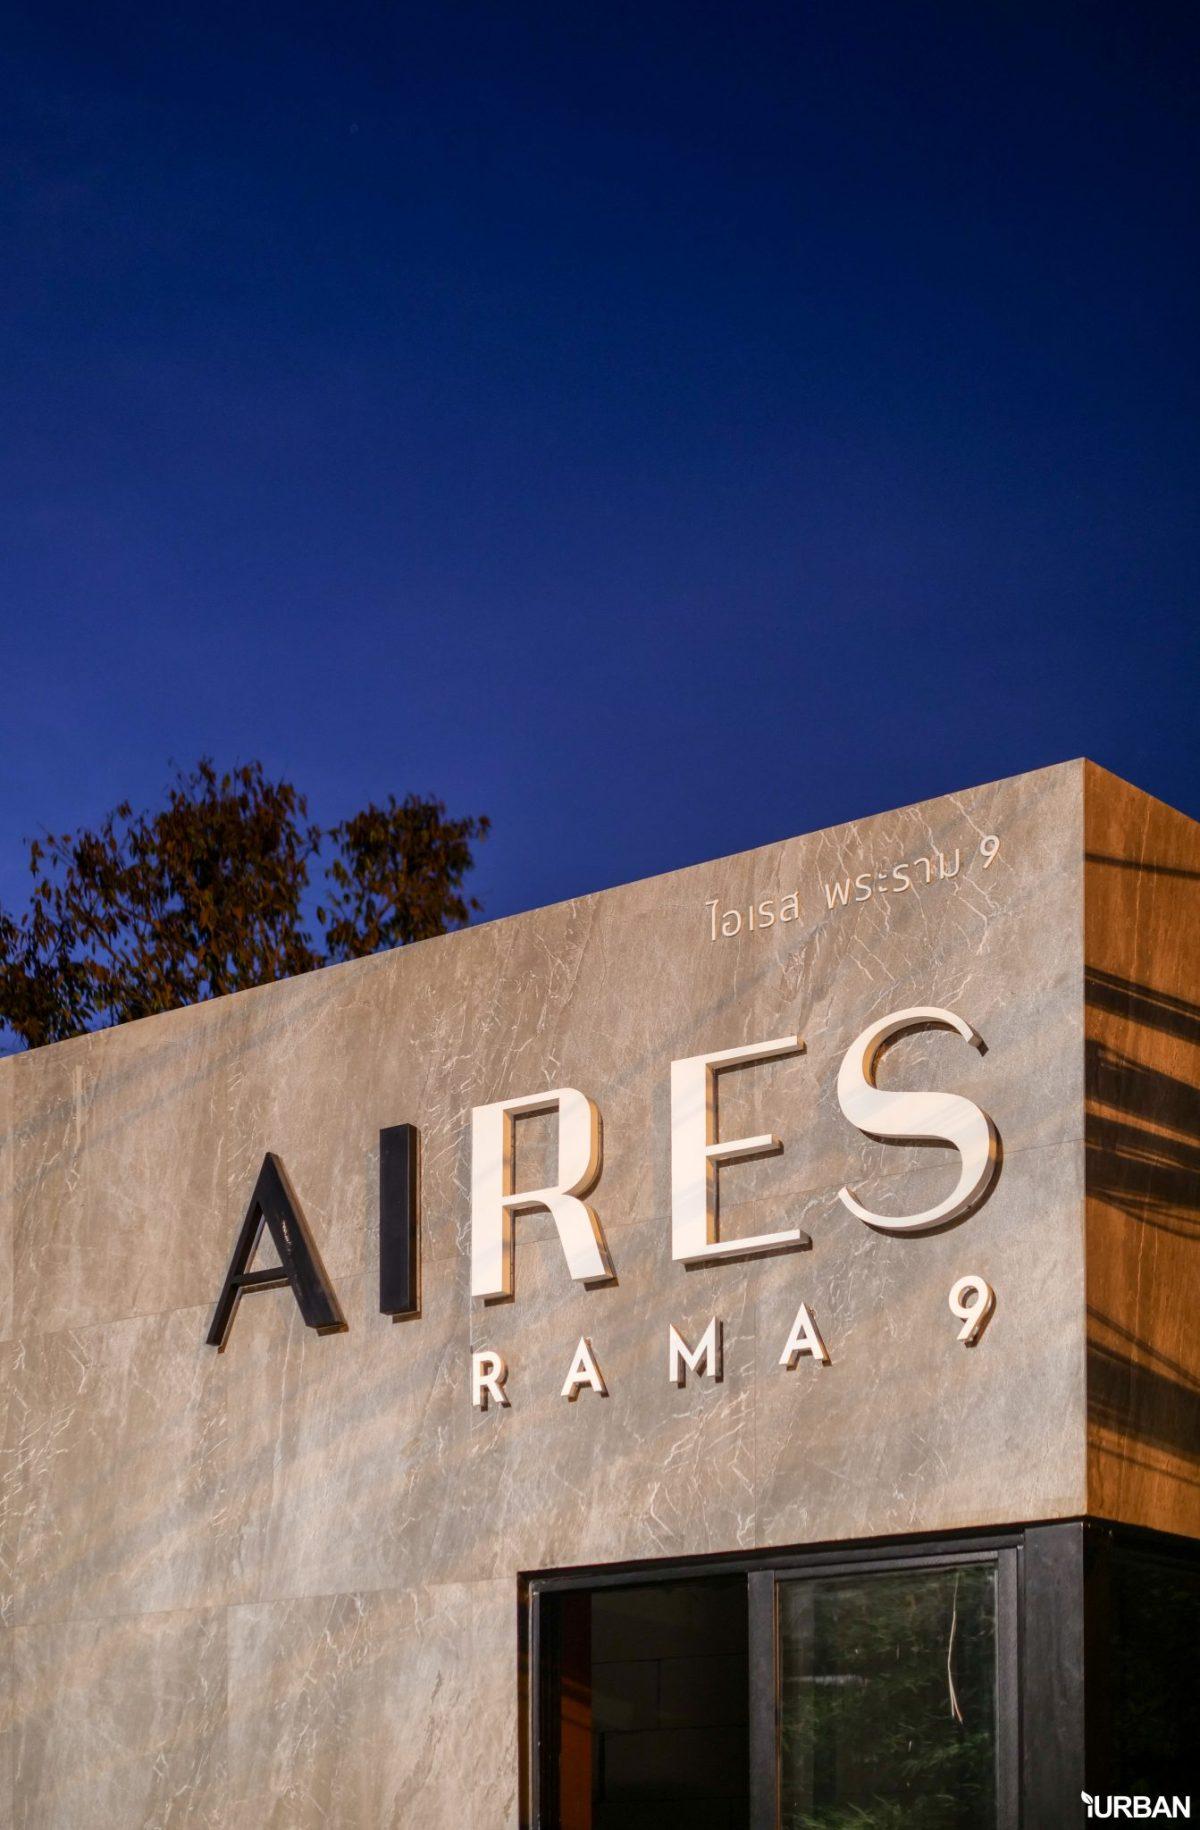 AIRES RAMA9 รีวิว Luxury Townhome 3.5 ชั้น + Rooftop ออกแบบสวย ย่านพระราม9 (ใกล้ รพ.สมิติเวช) 19 - AIRES